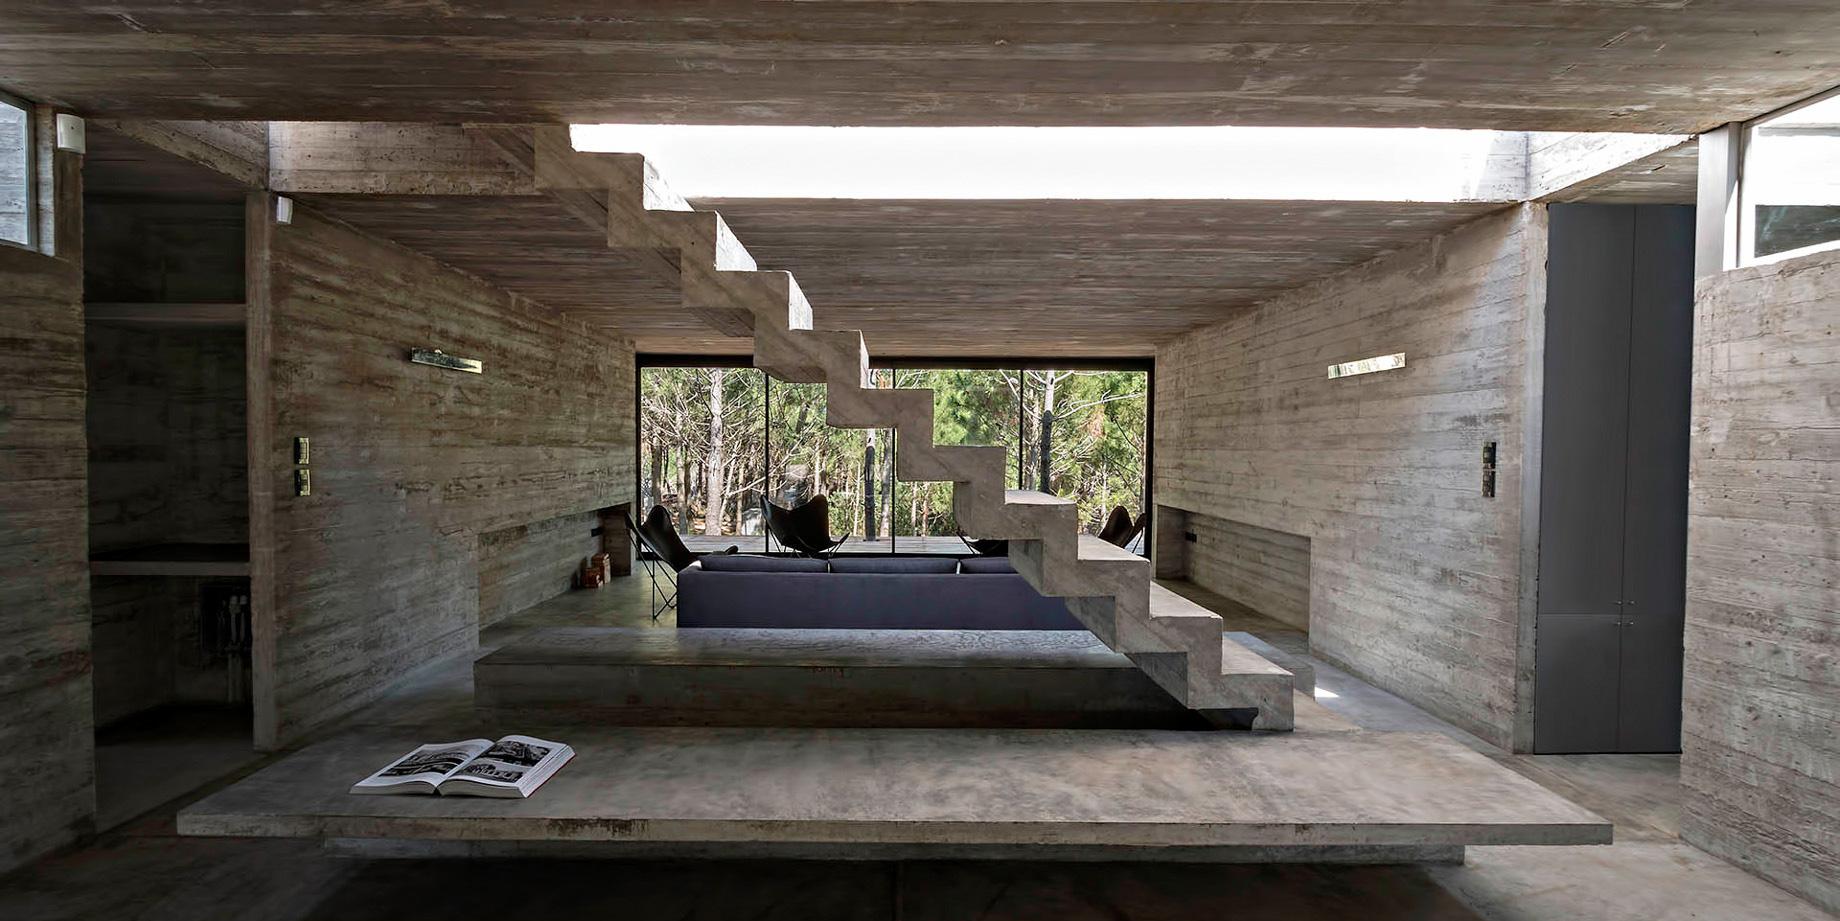 L4 House - Costa Esmeralda, Buenos Aires, Argentina